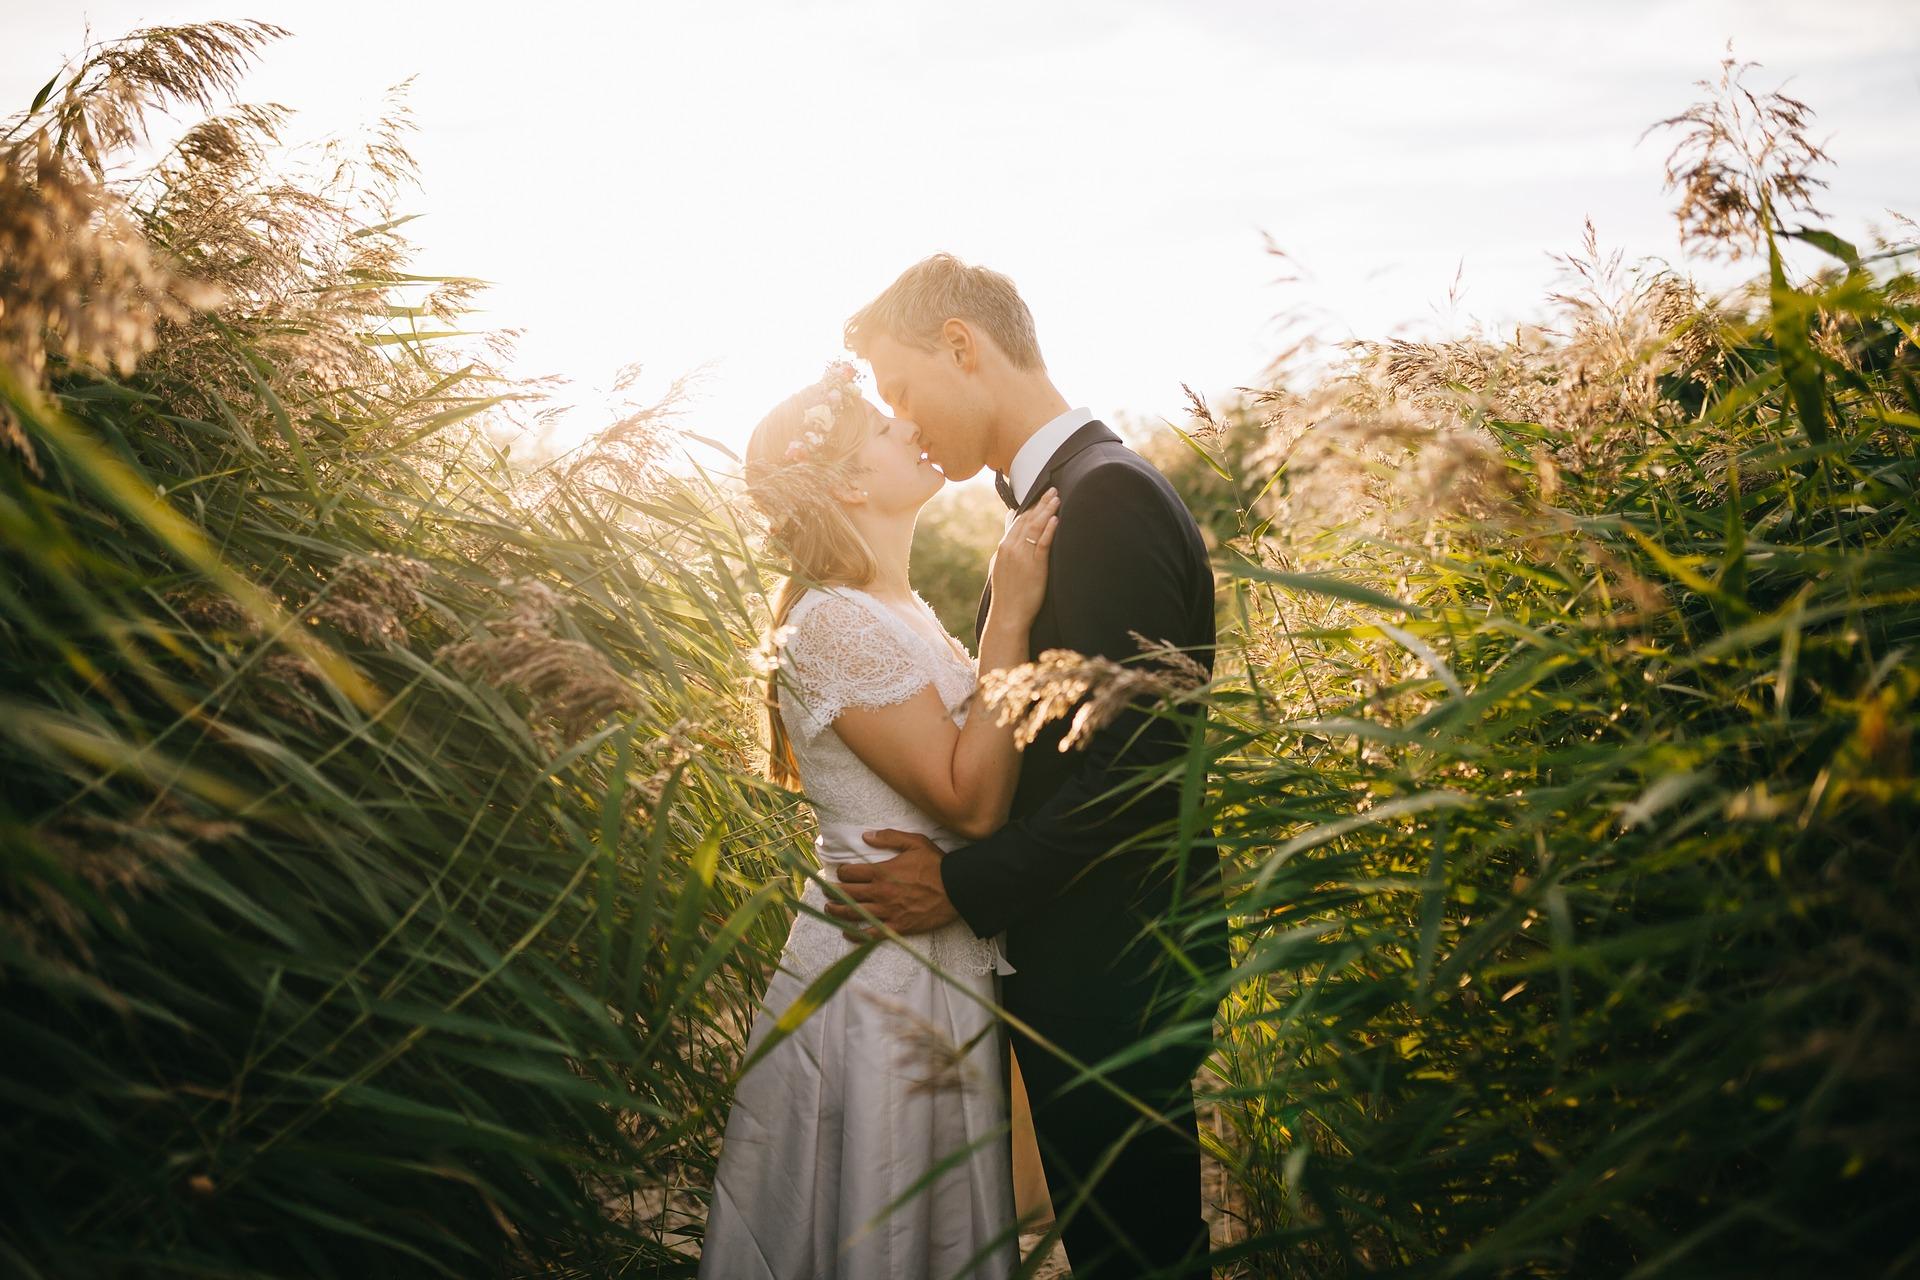 Обязанности супругов в браке.